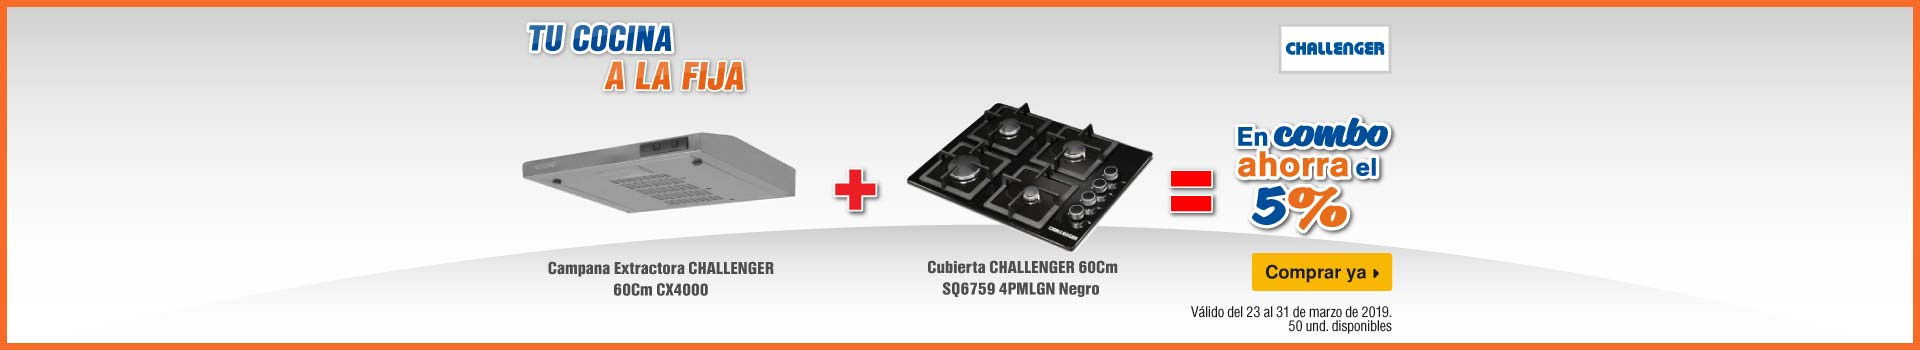 AK-KT-mayores-2-ELECT-BCAT-cocina-challenger-230319